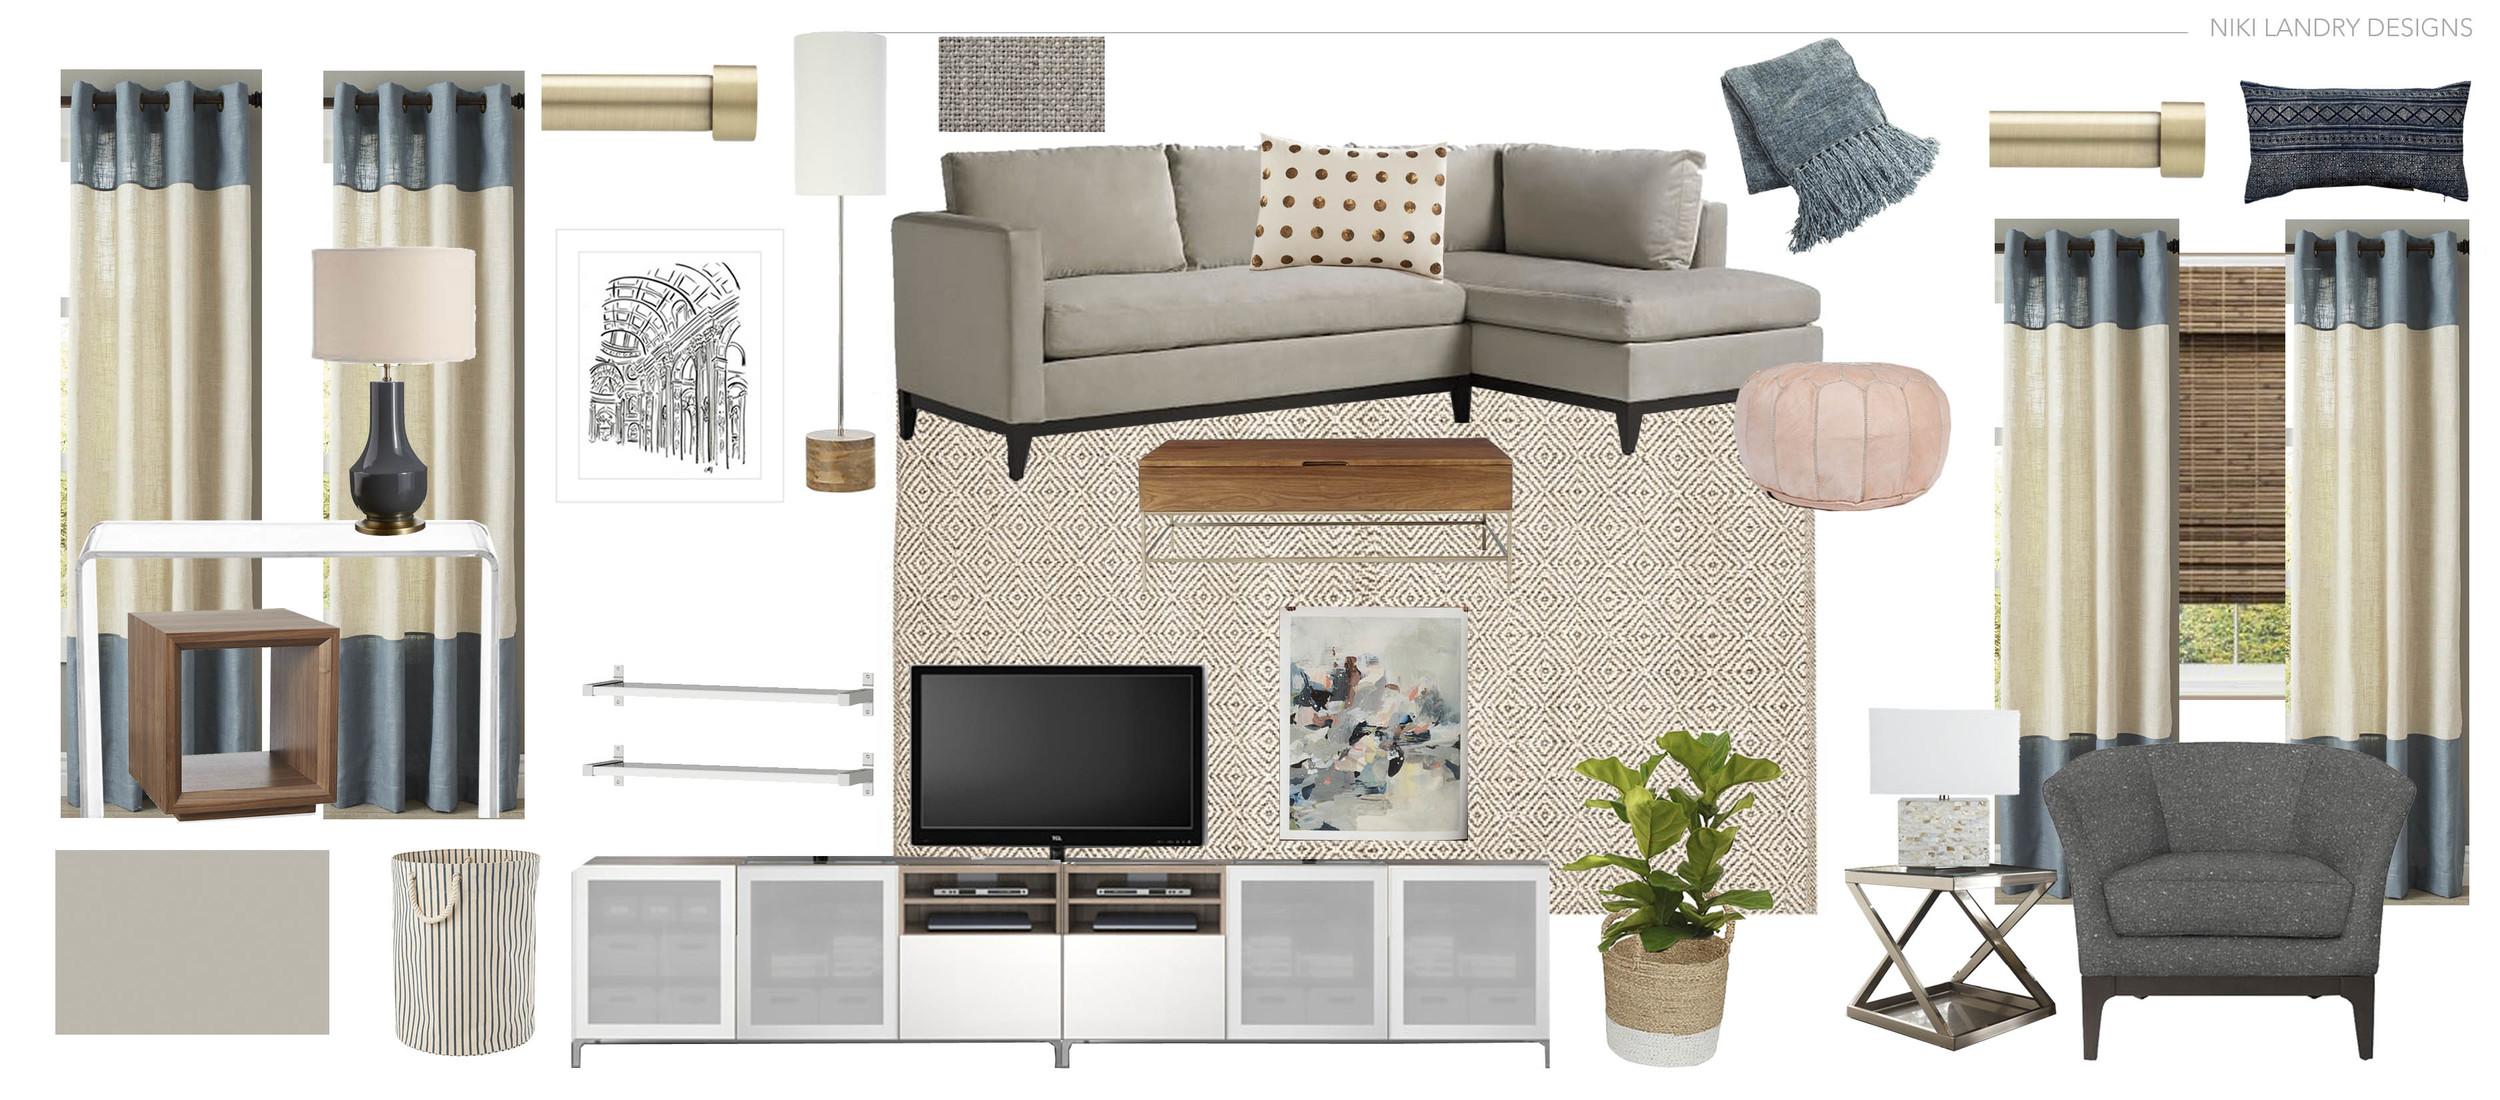 Copy of Living Room Design